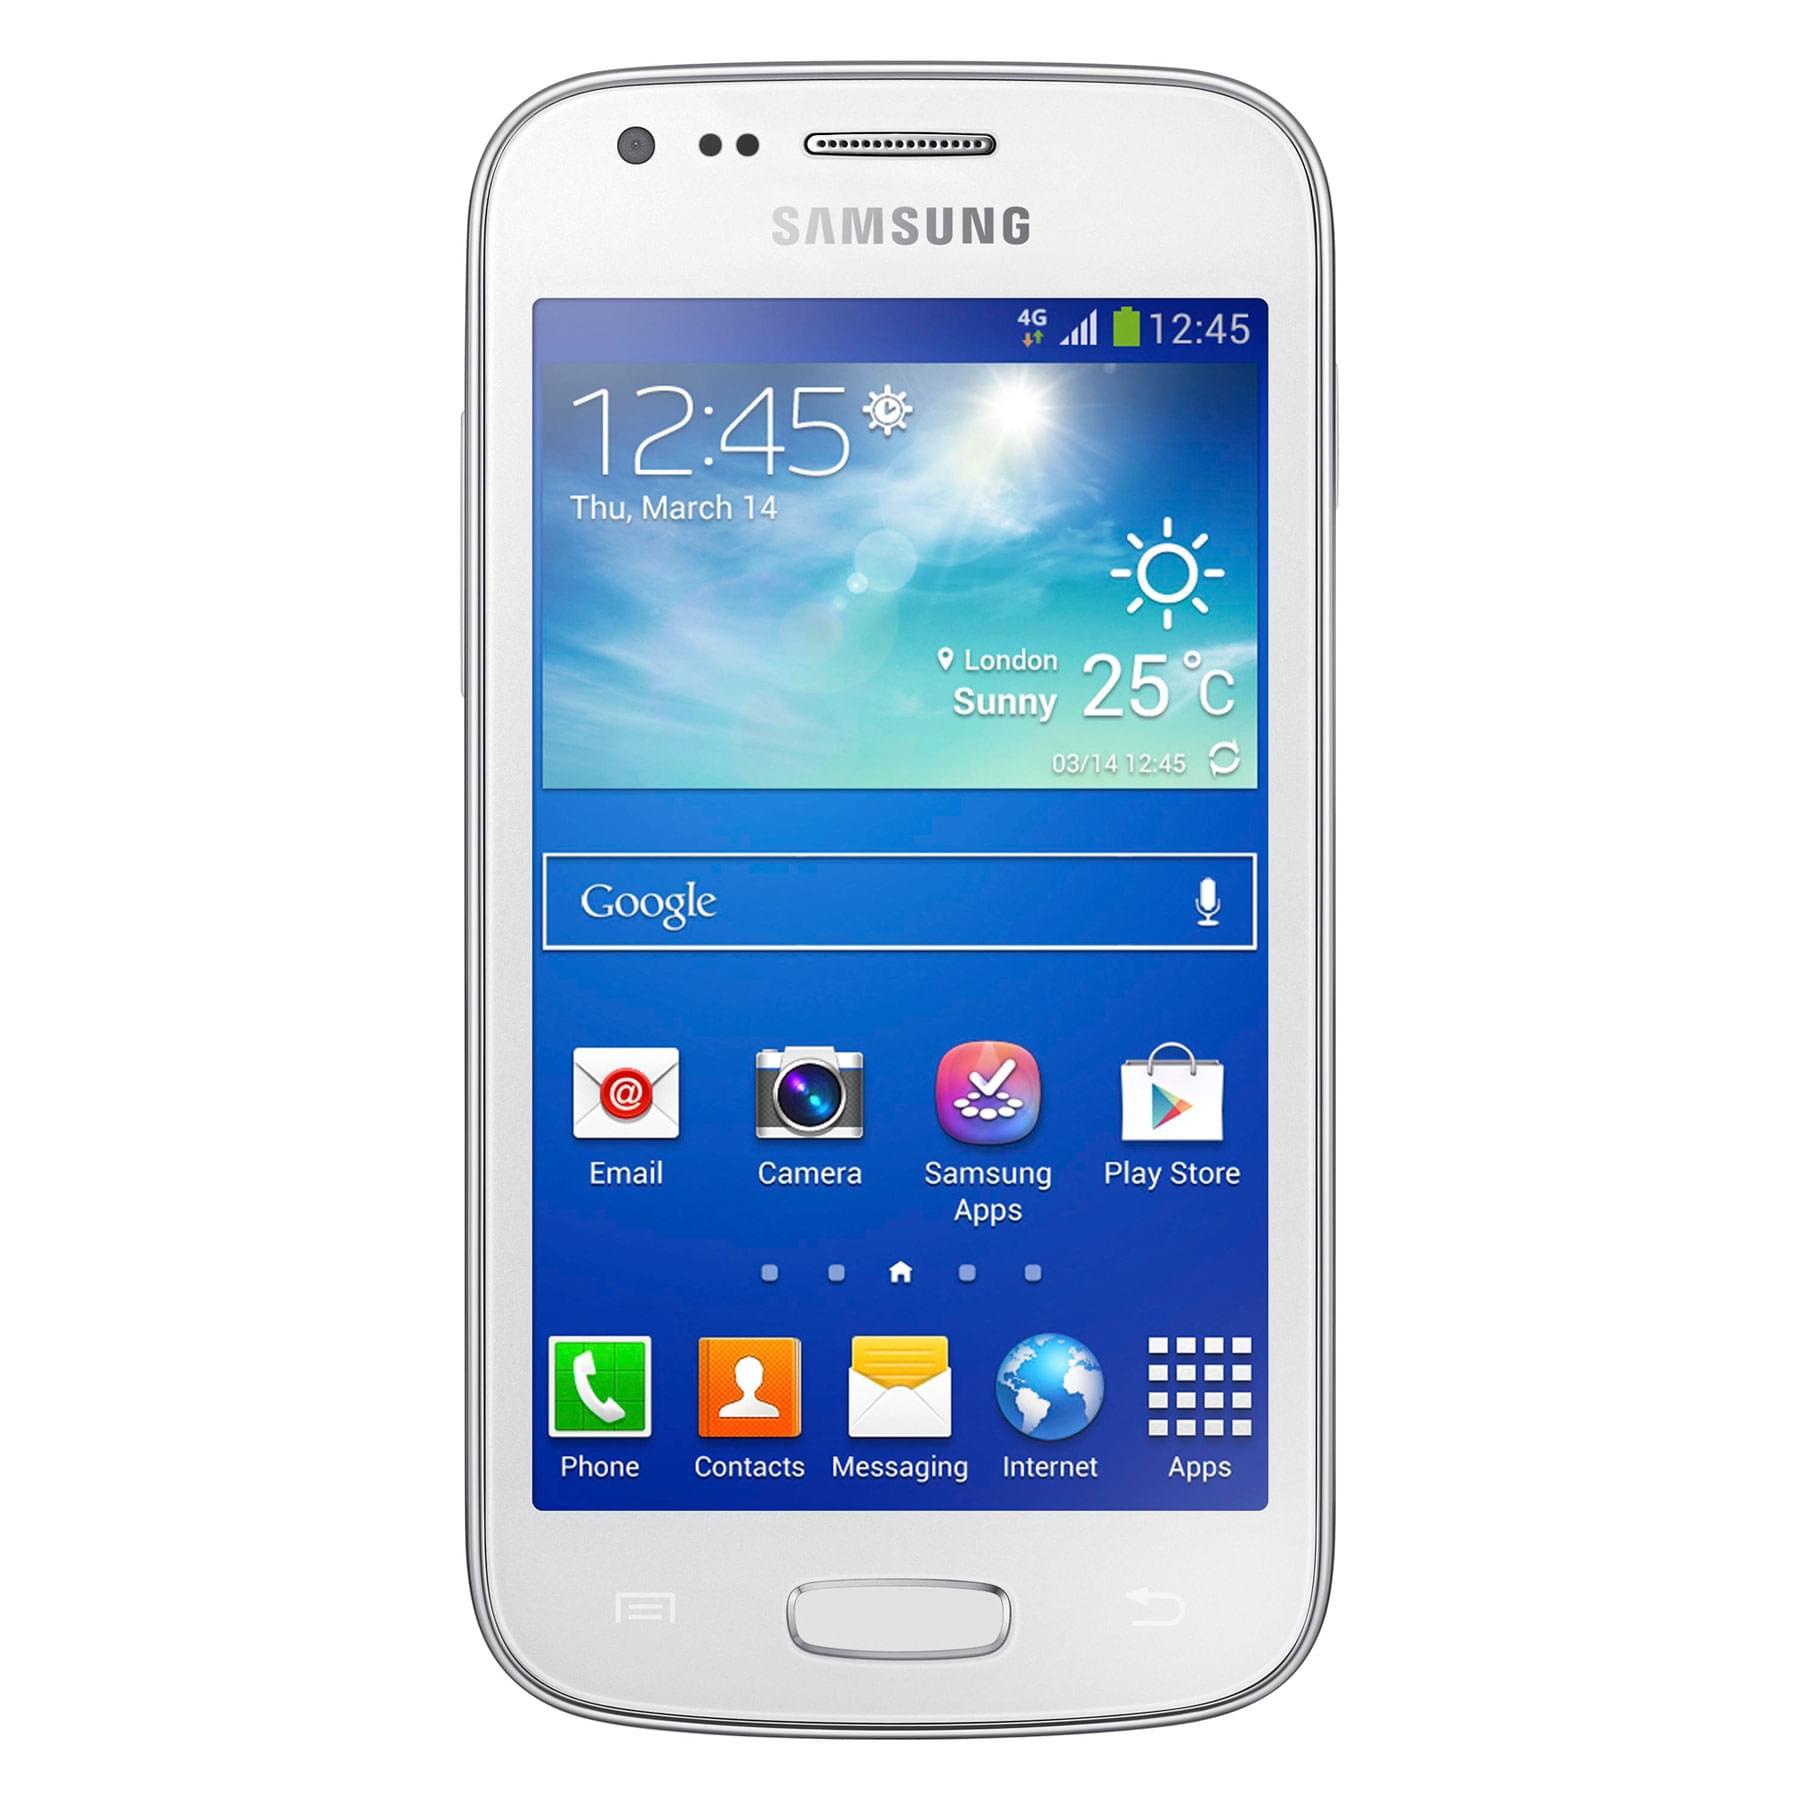 Samsung Galaxy Ace 3 8Go Blanc S7275 (GT-S7275UWNXEF) - Achat / Vente Téléphonie sur Cybertek.fr - 0